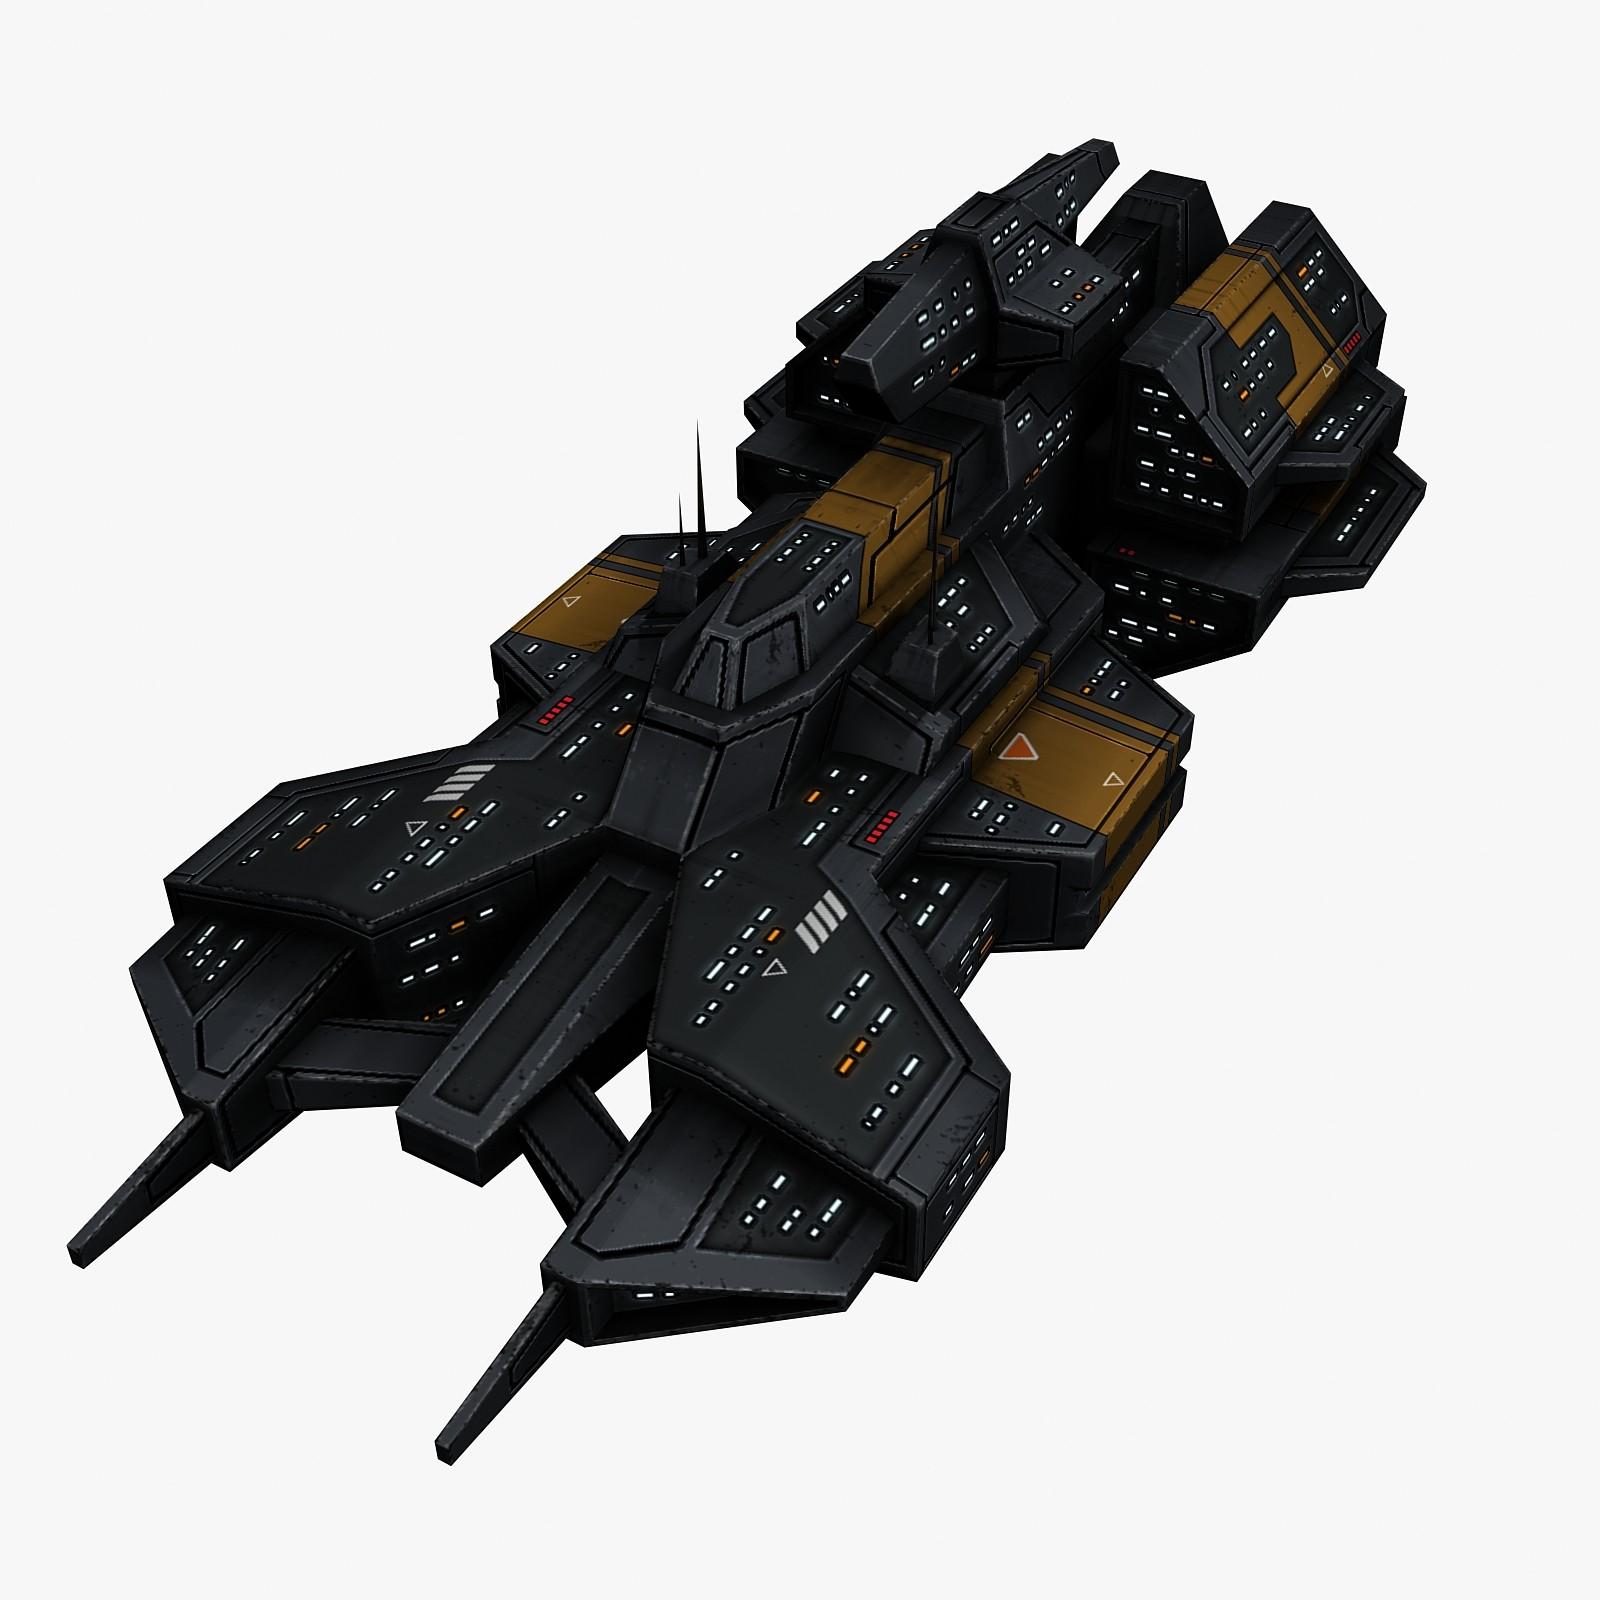 space_battleship_2_preview_1.jpg